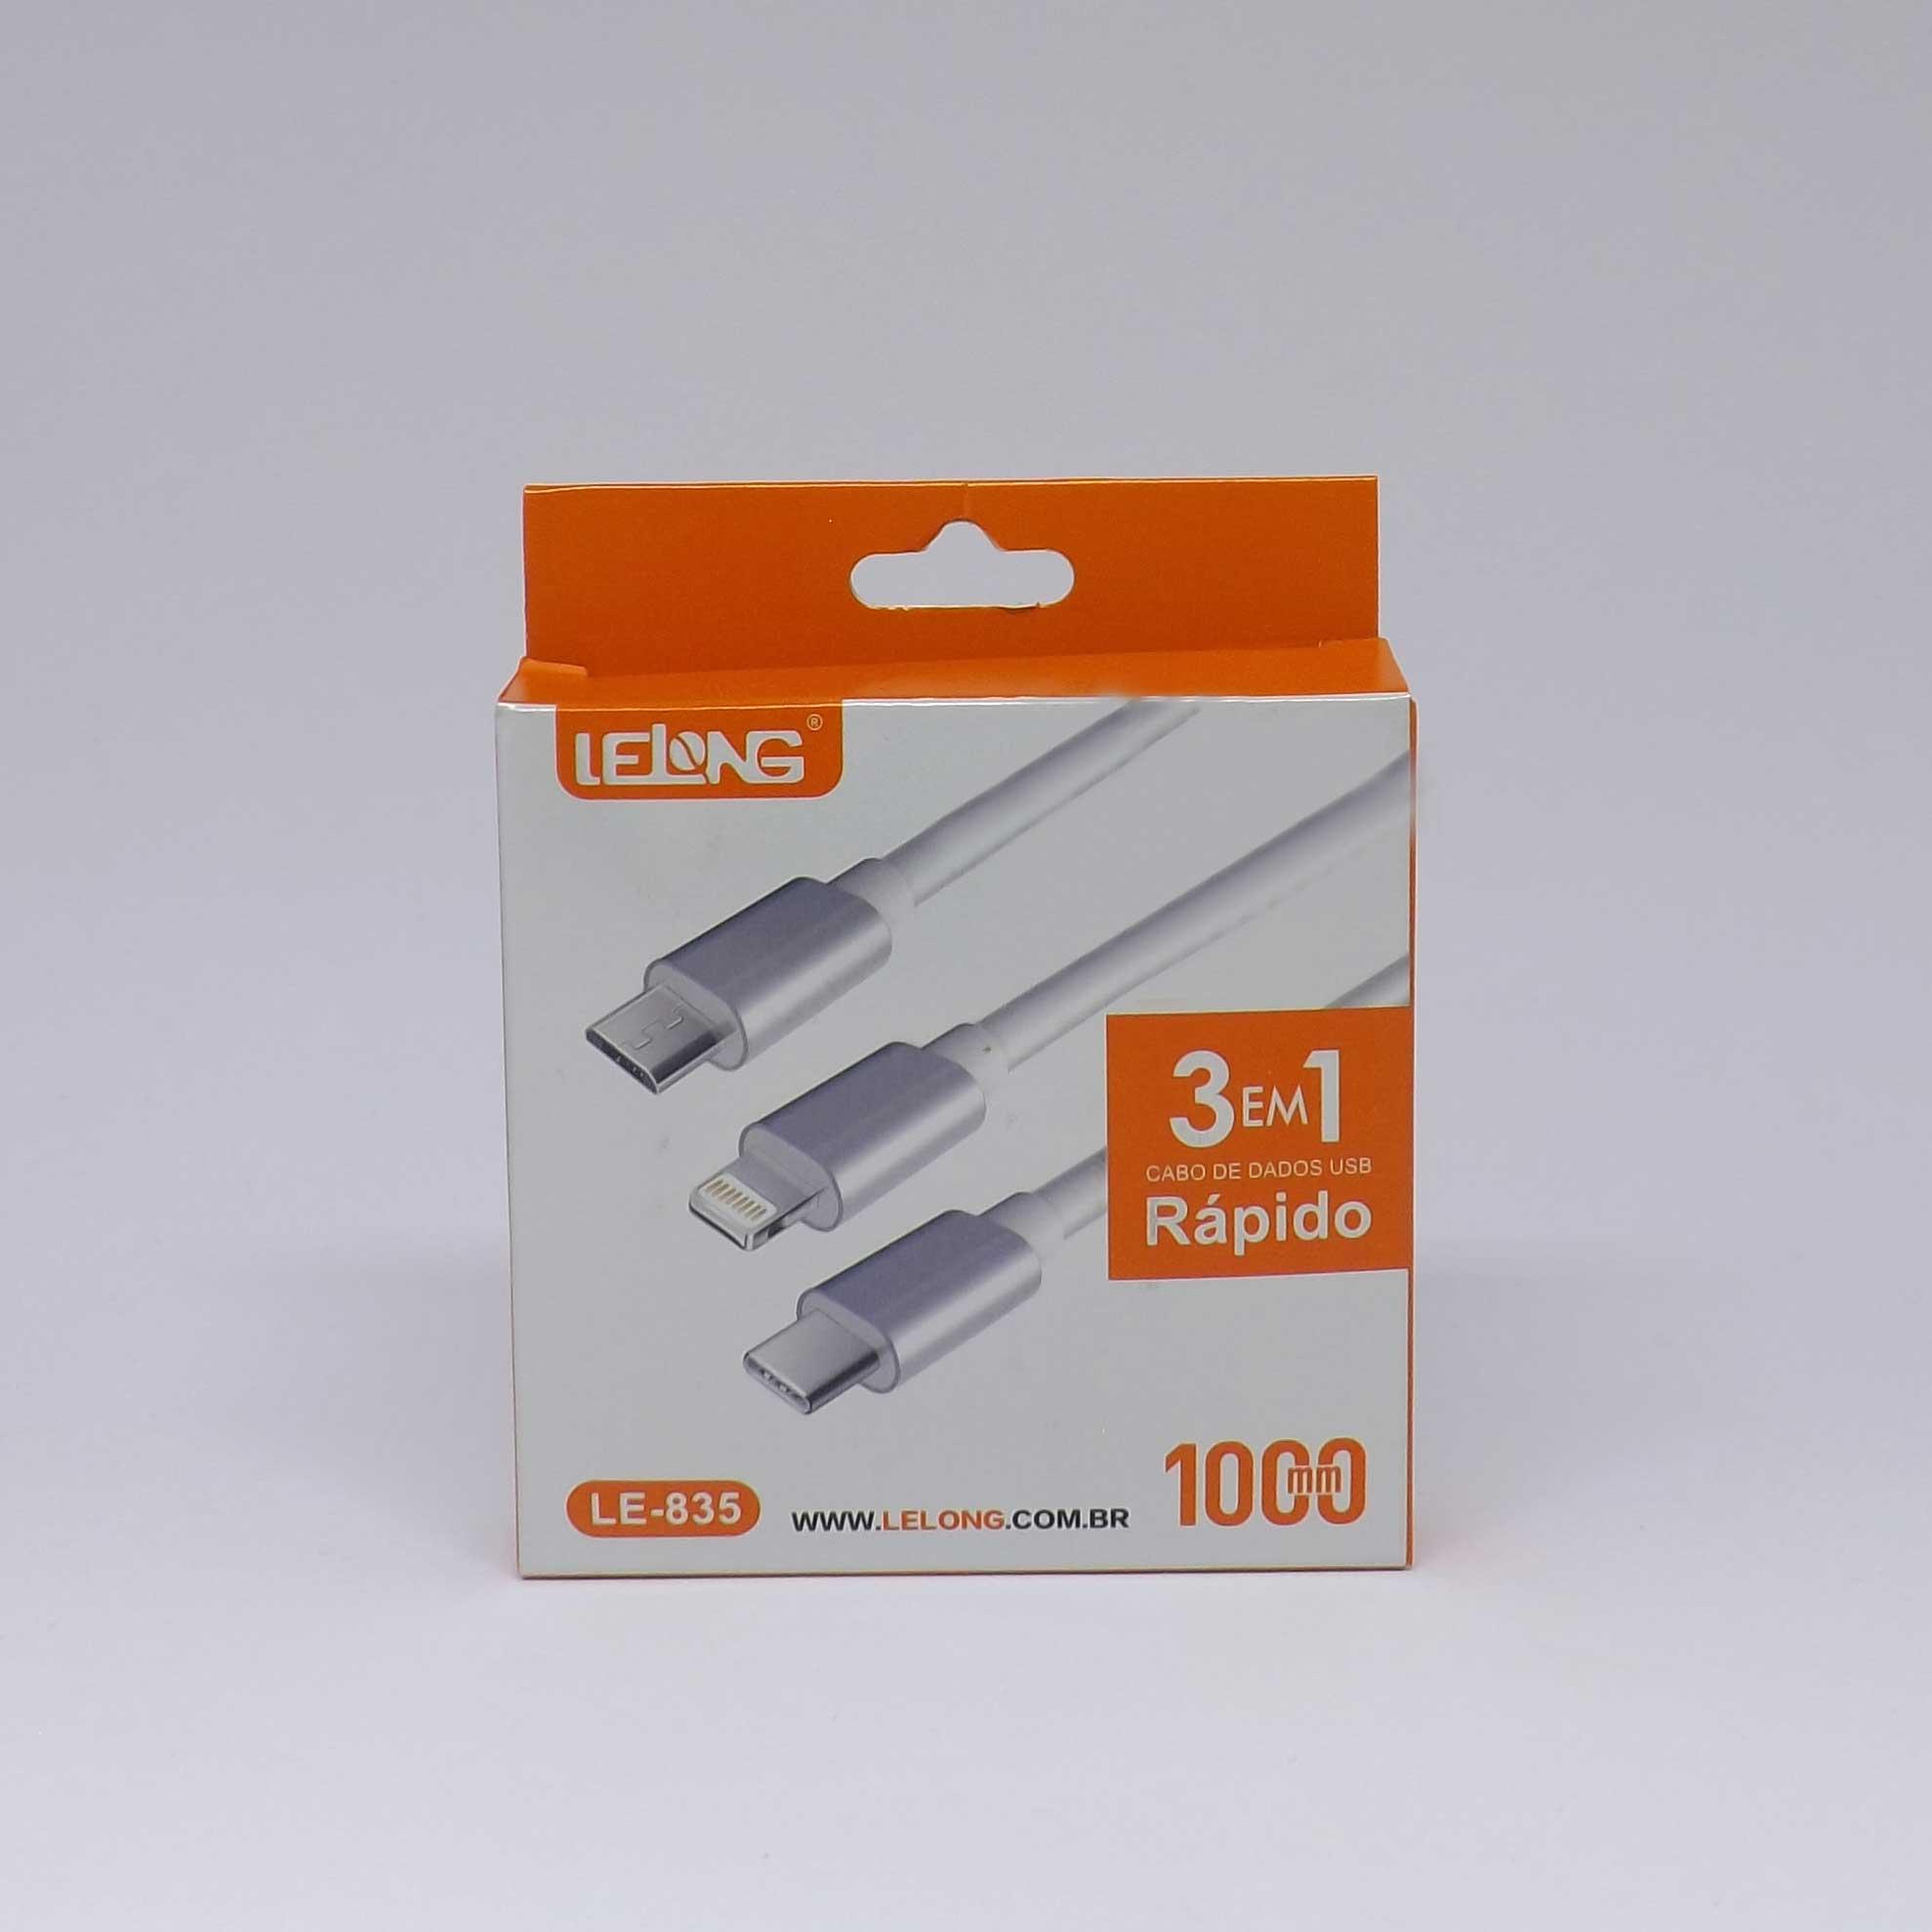 Cabo USB Lelong 3 em 1 (Lightning, V8 e Tipo C)